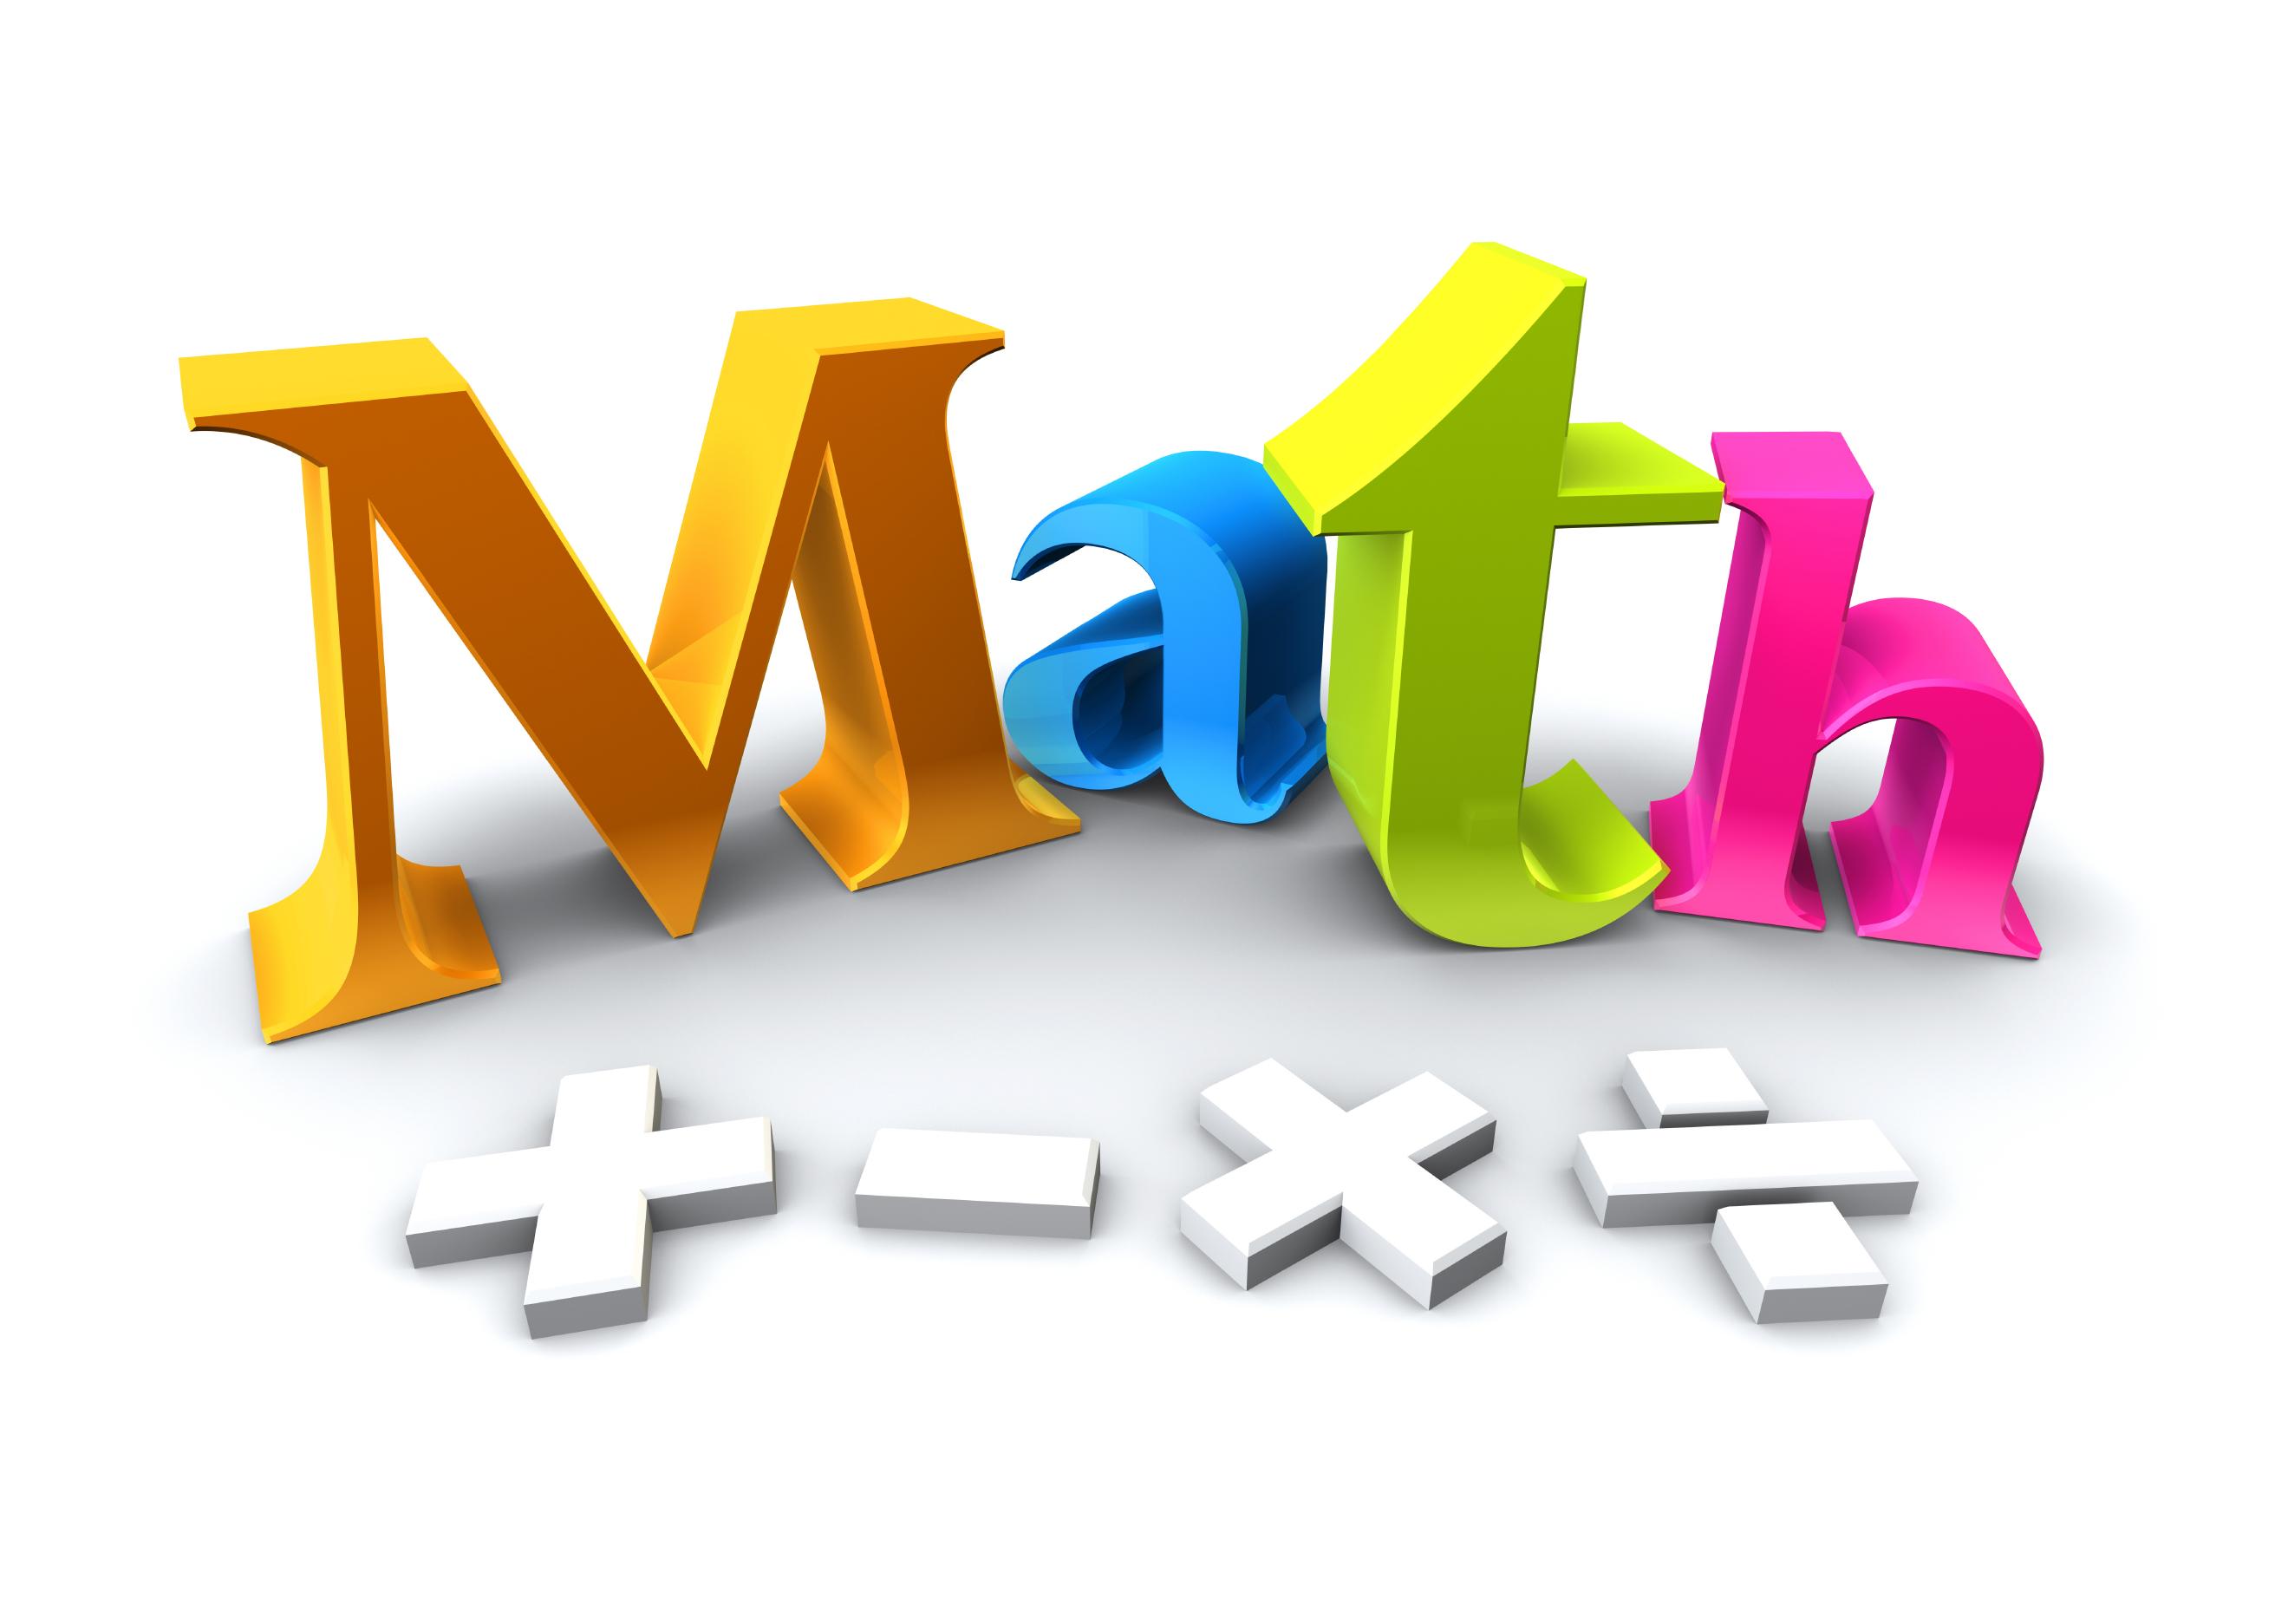 Eureka Math EQUIP 1st-5th Grade Teachers and Support Staff - GROUP #1 (VIRTUAL PD 8:00-11:00)